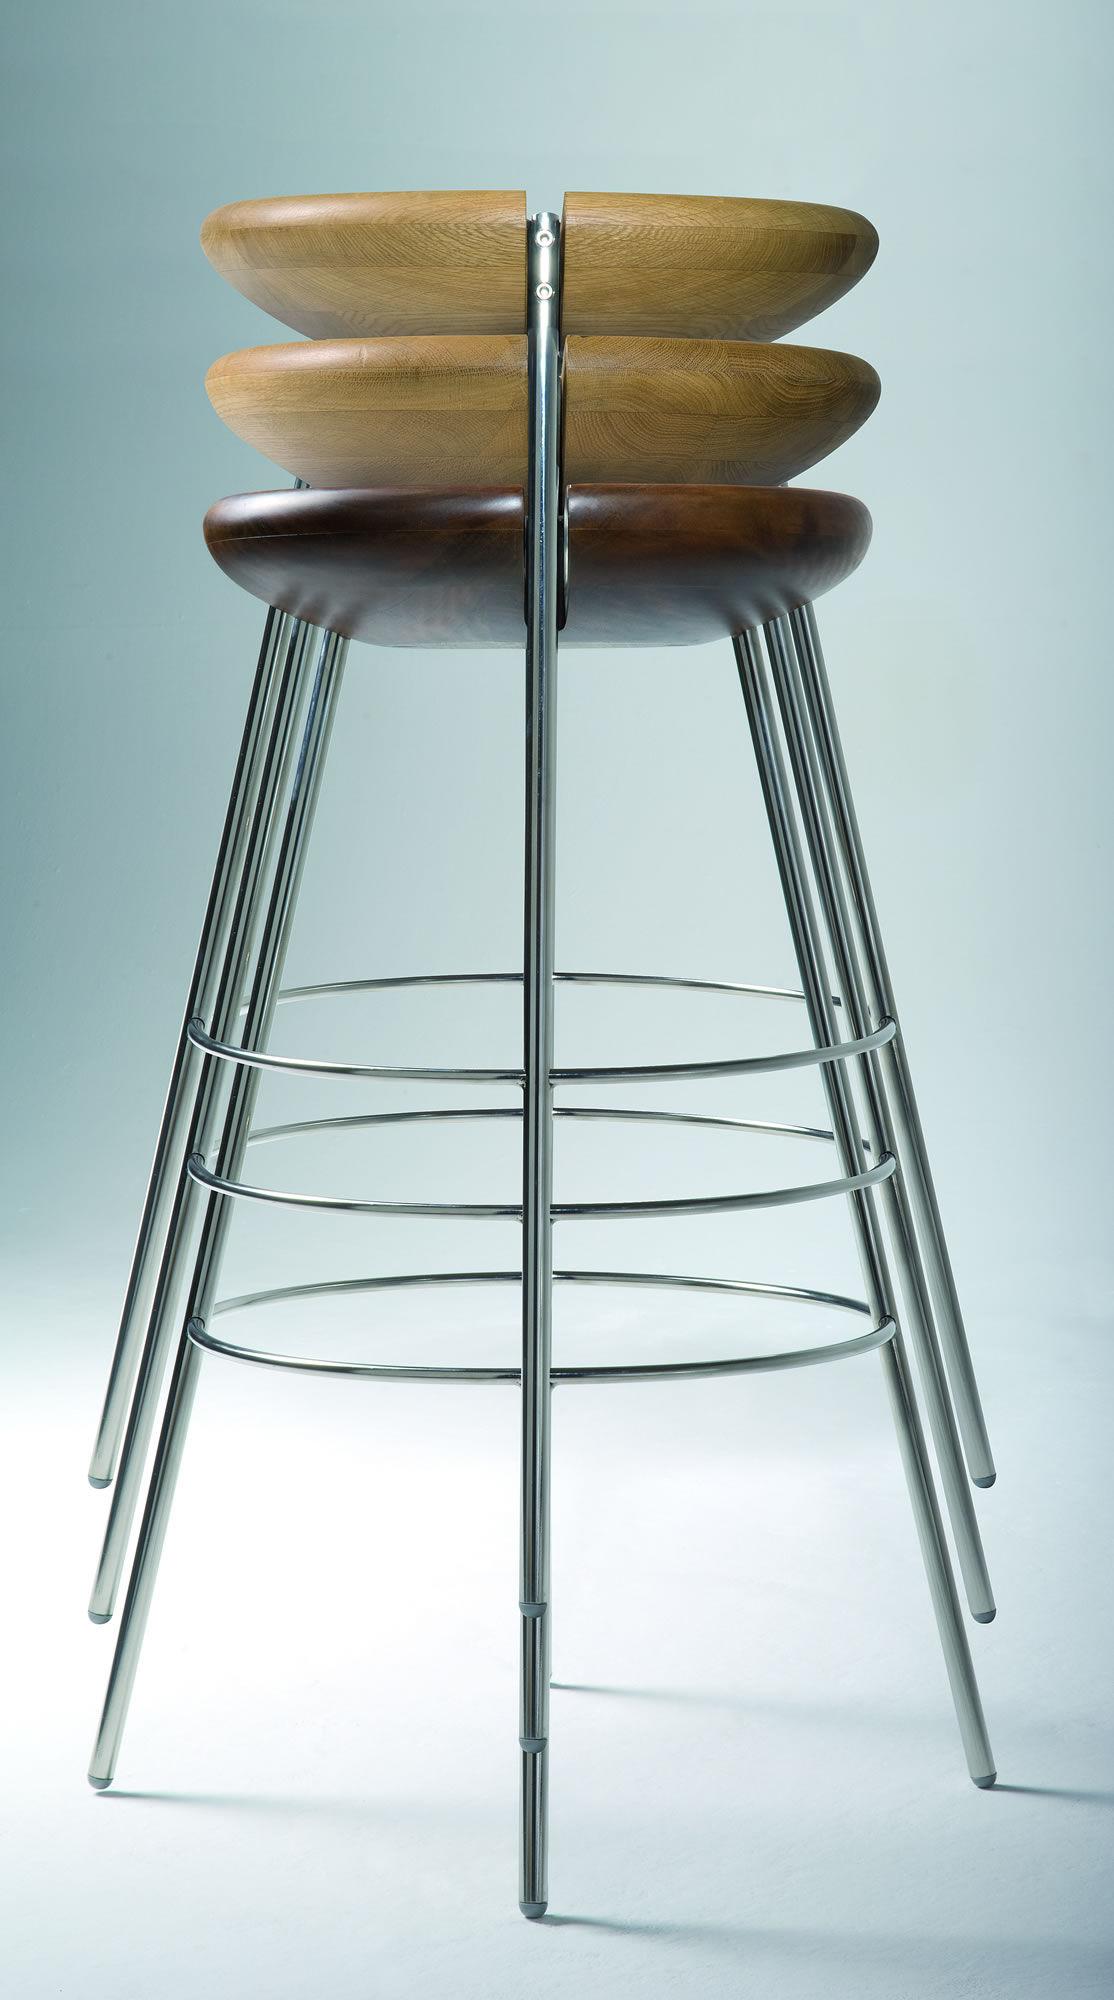 Tribo Bar stool H 76 cm Wood amp metal legs solid oak  : babfbf97 4468 40b0 86ac 57be4217e9fb from www.madeindesign.co.uk size 1114 x 2000 jpeg 178kB